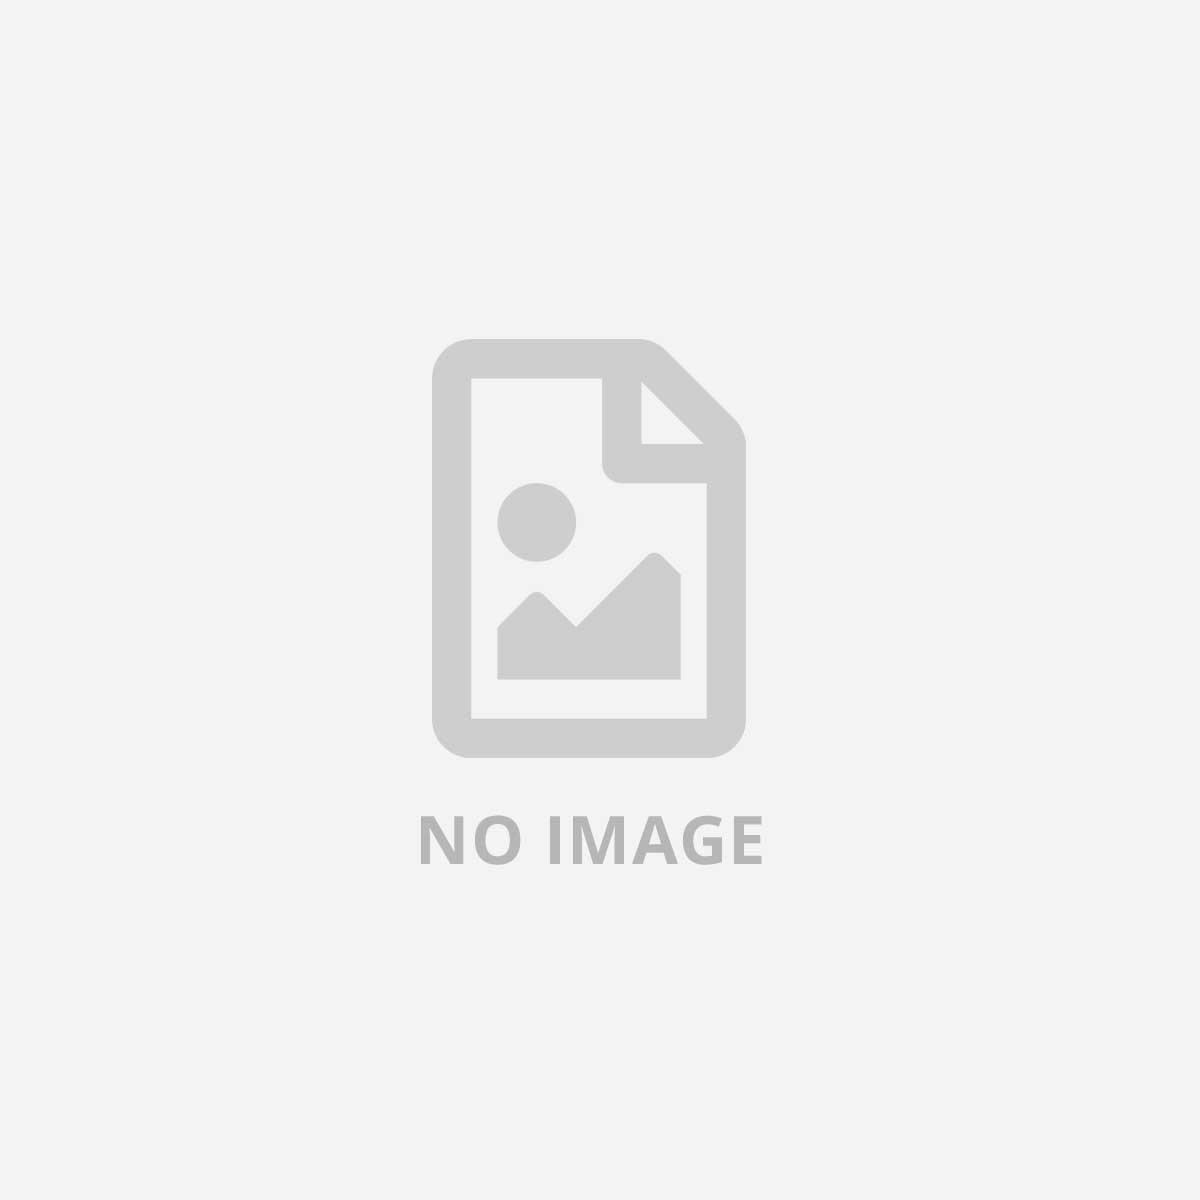 NILOX BATTERIA UPS 12V 5AH